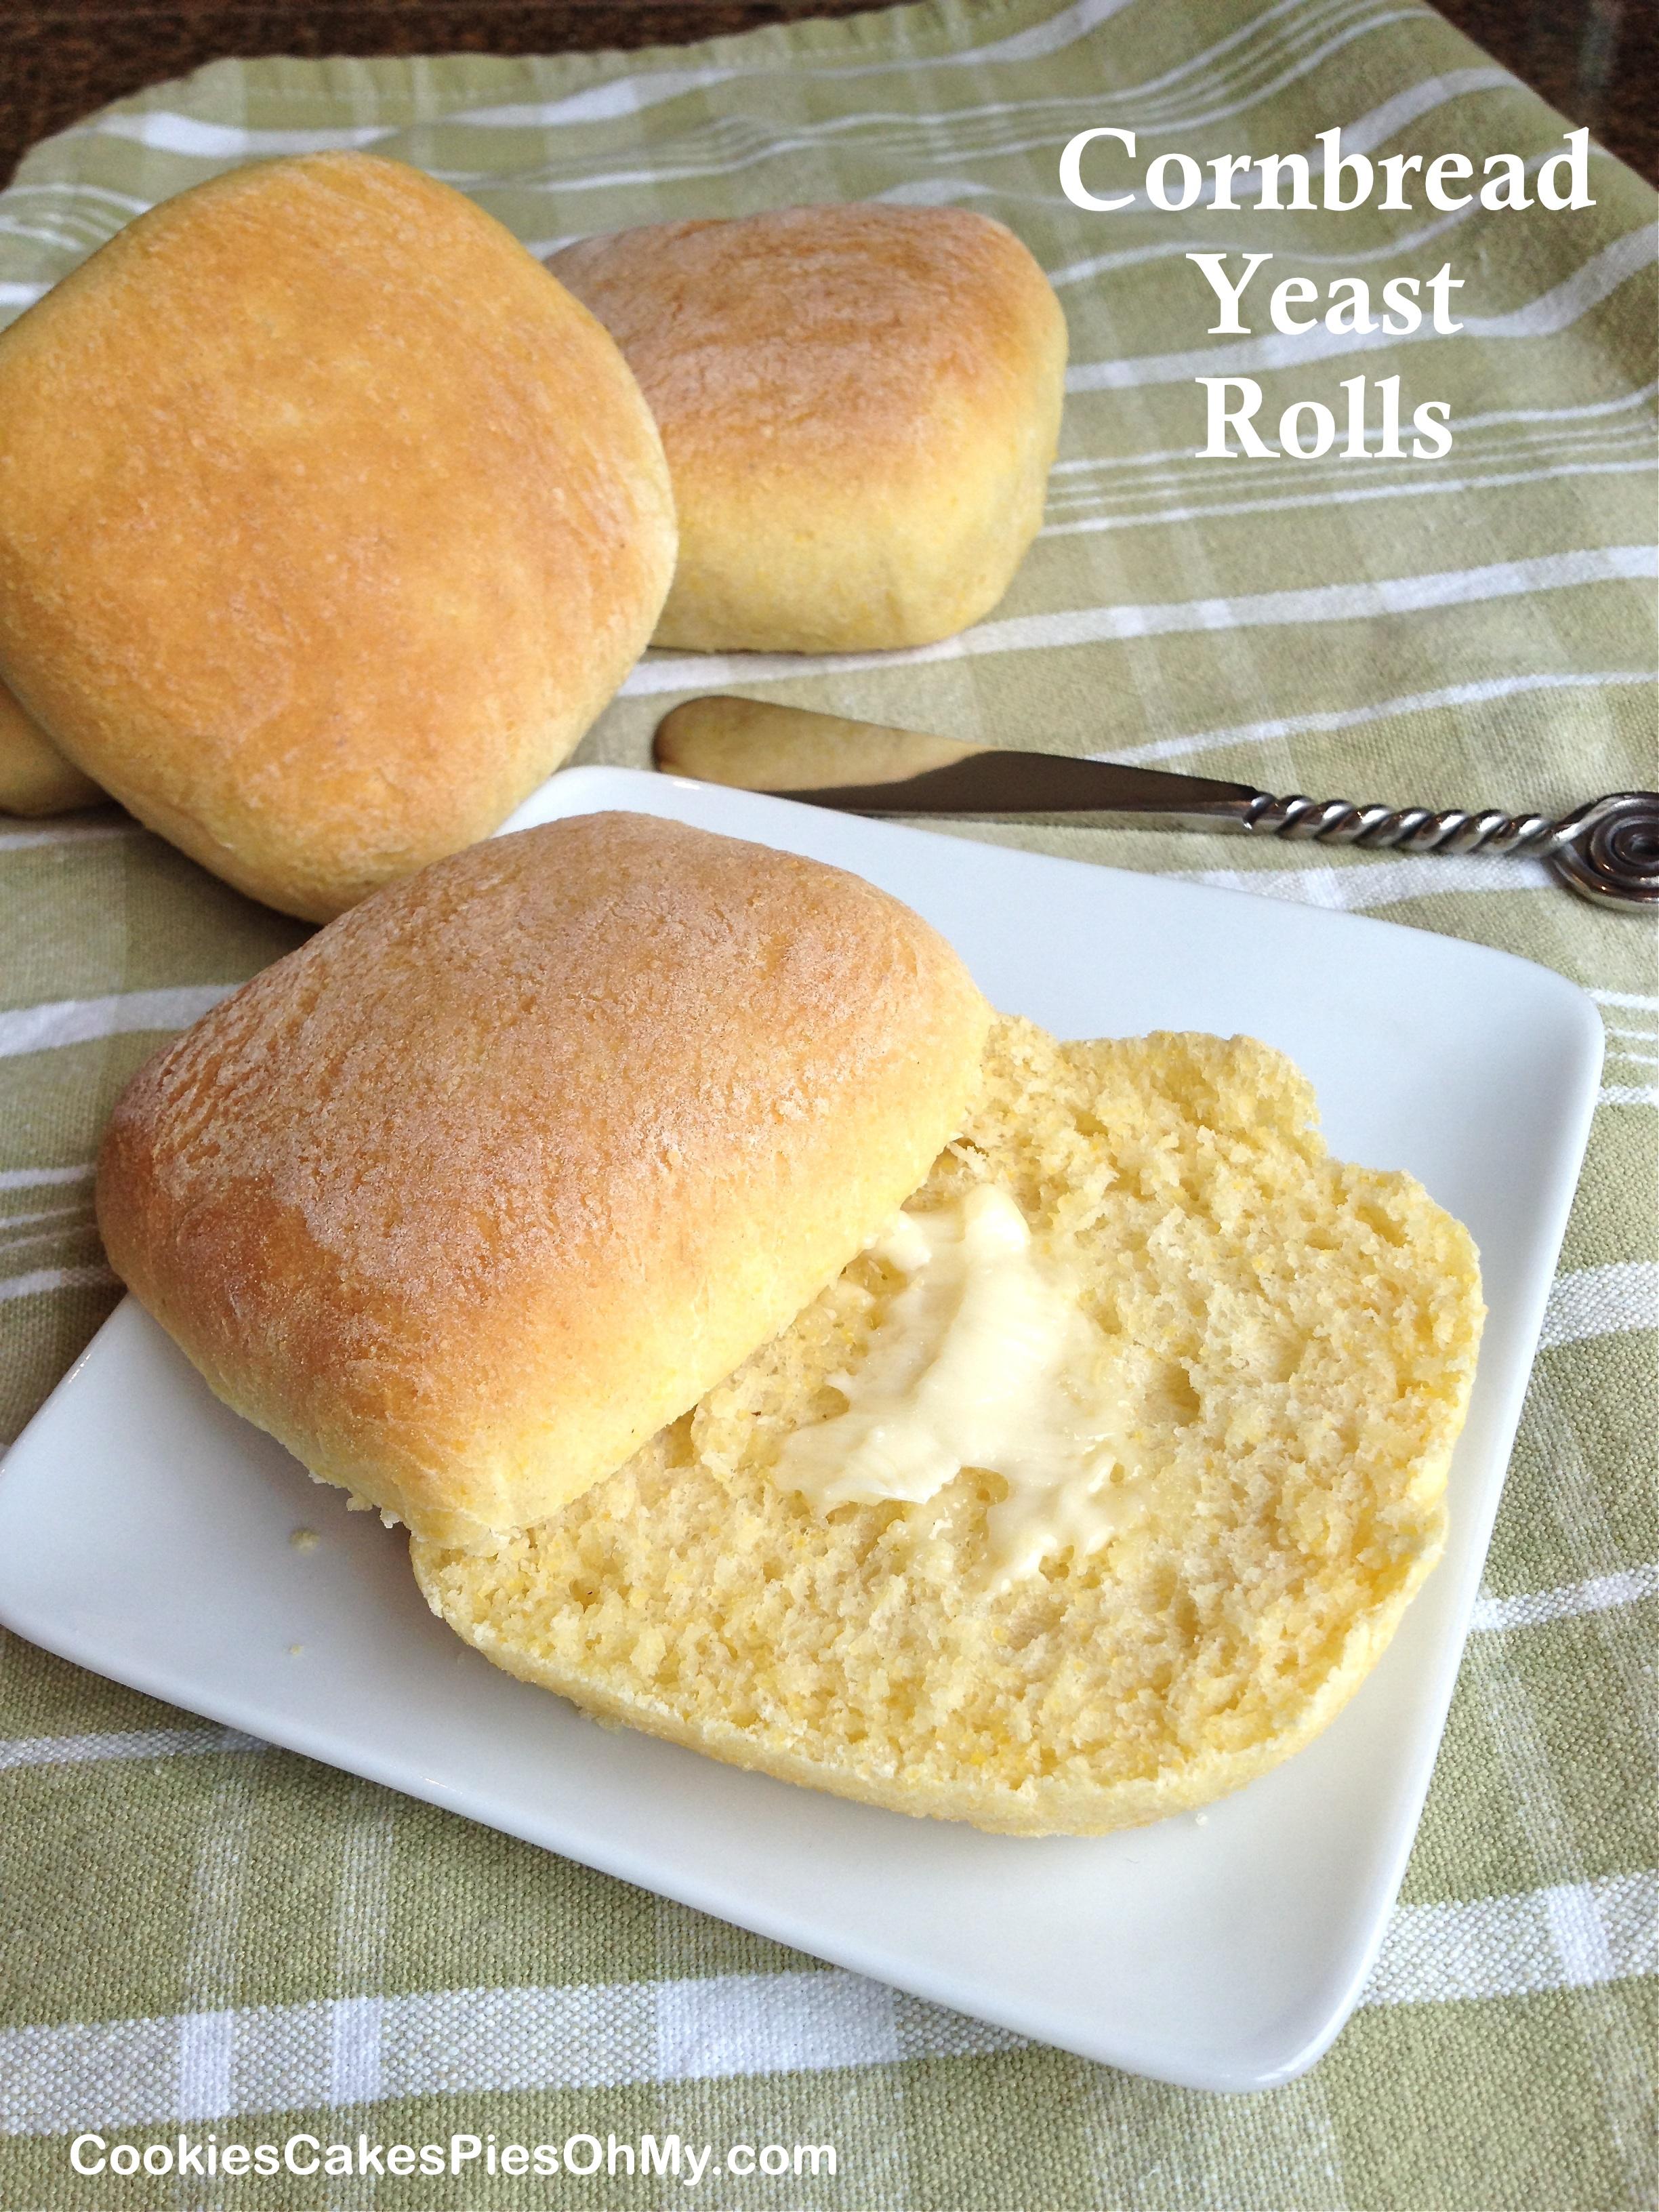 Yeast Breads | CookiesCakesPiesOhMy